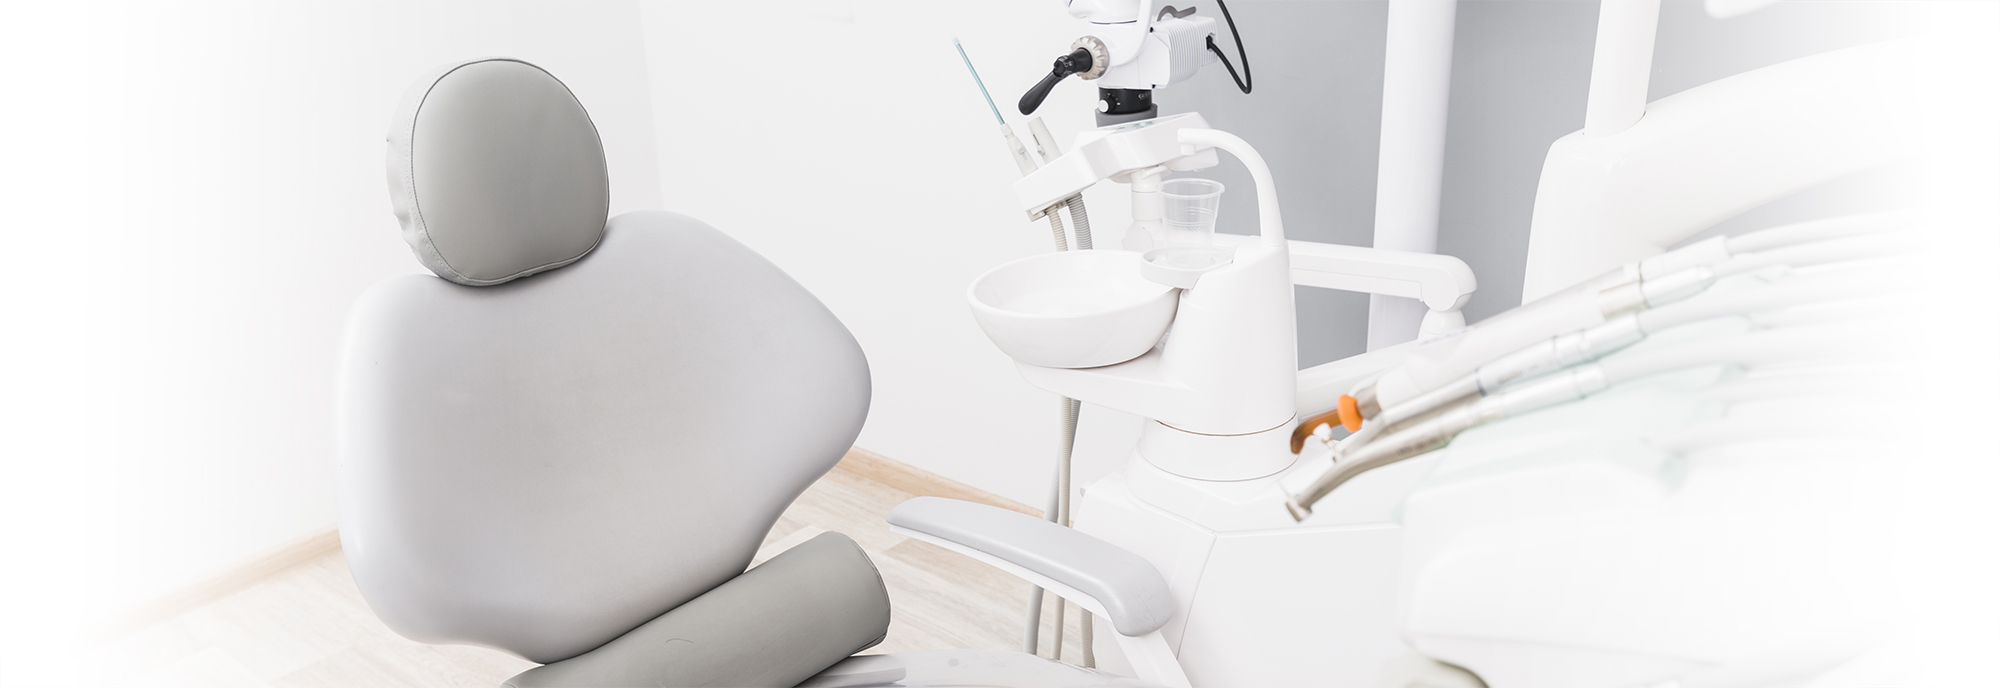 odontologo-tratamiento-orthoapnea